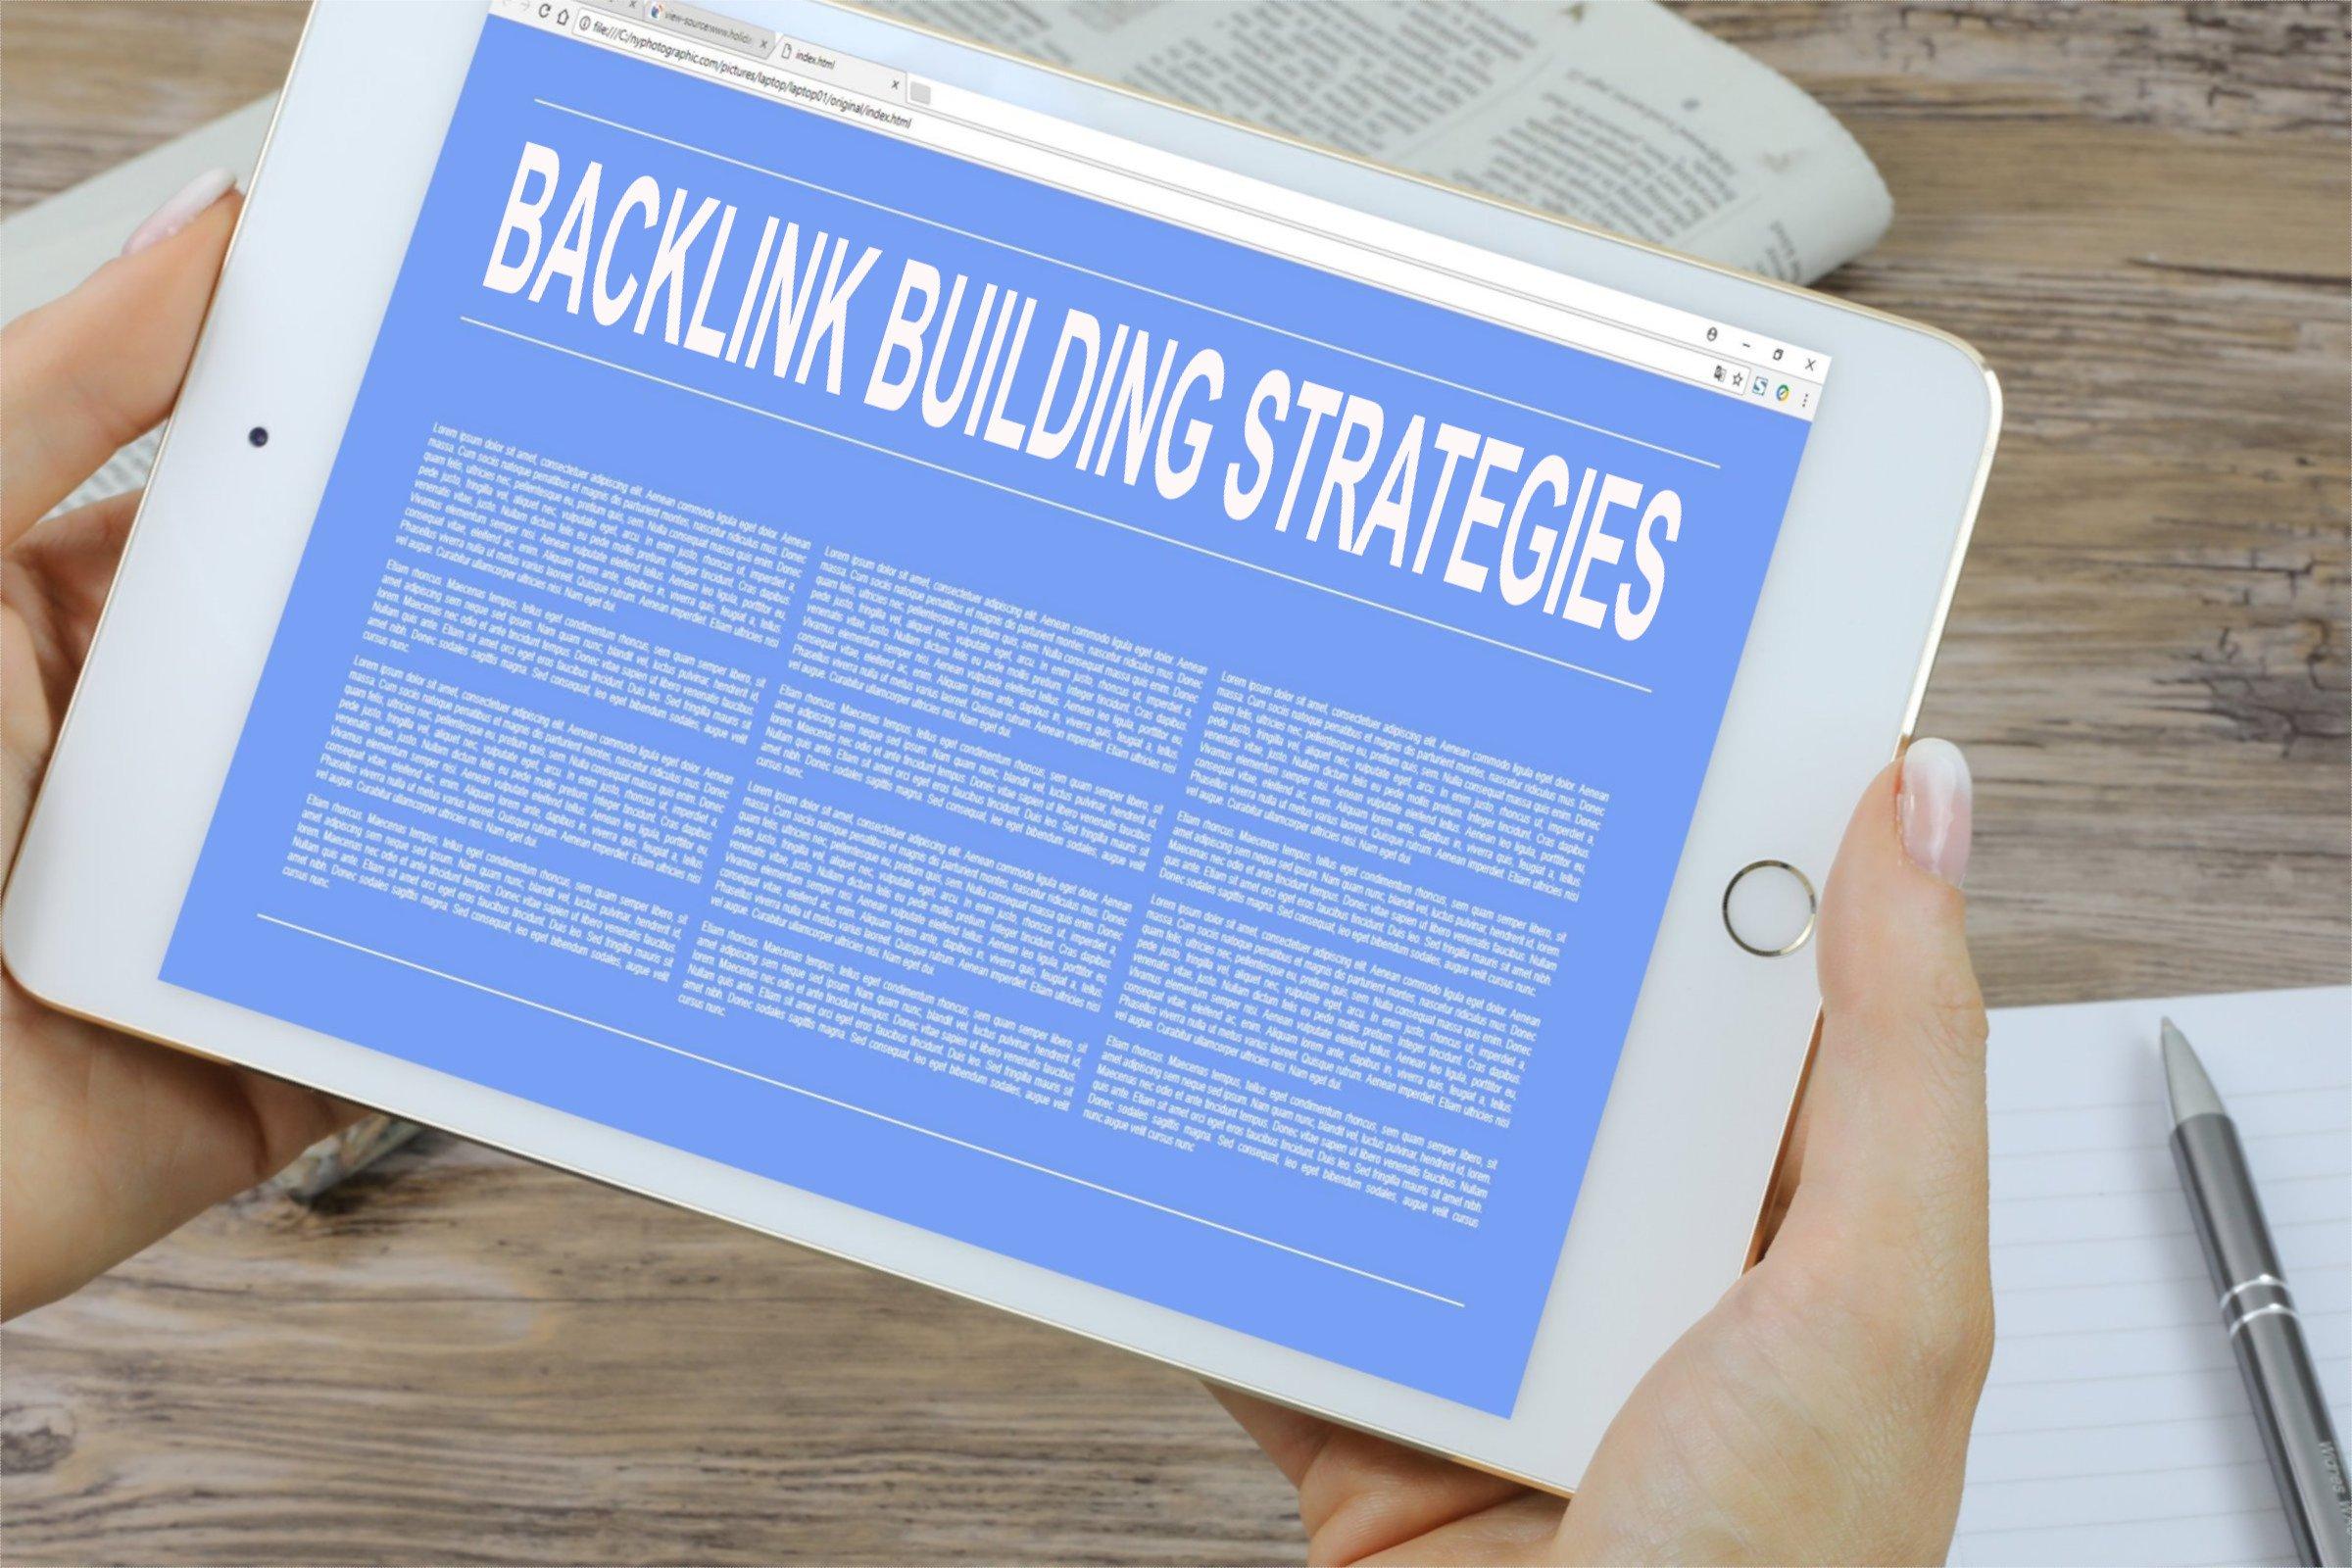 Backlink Building Strategies